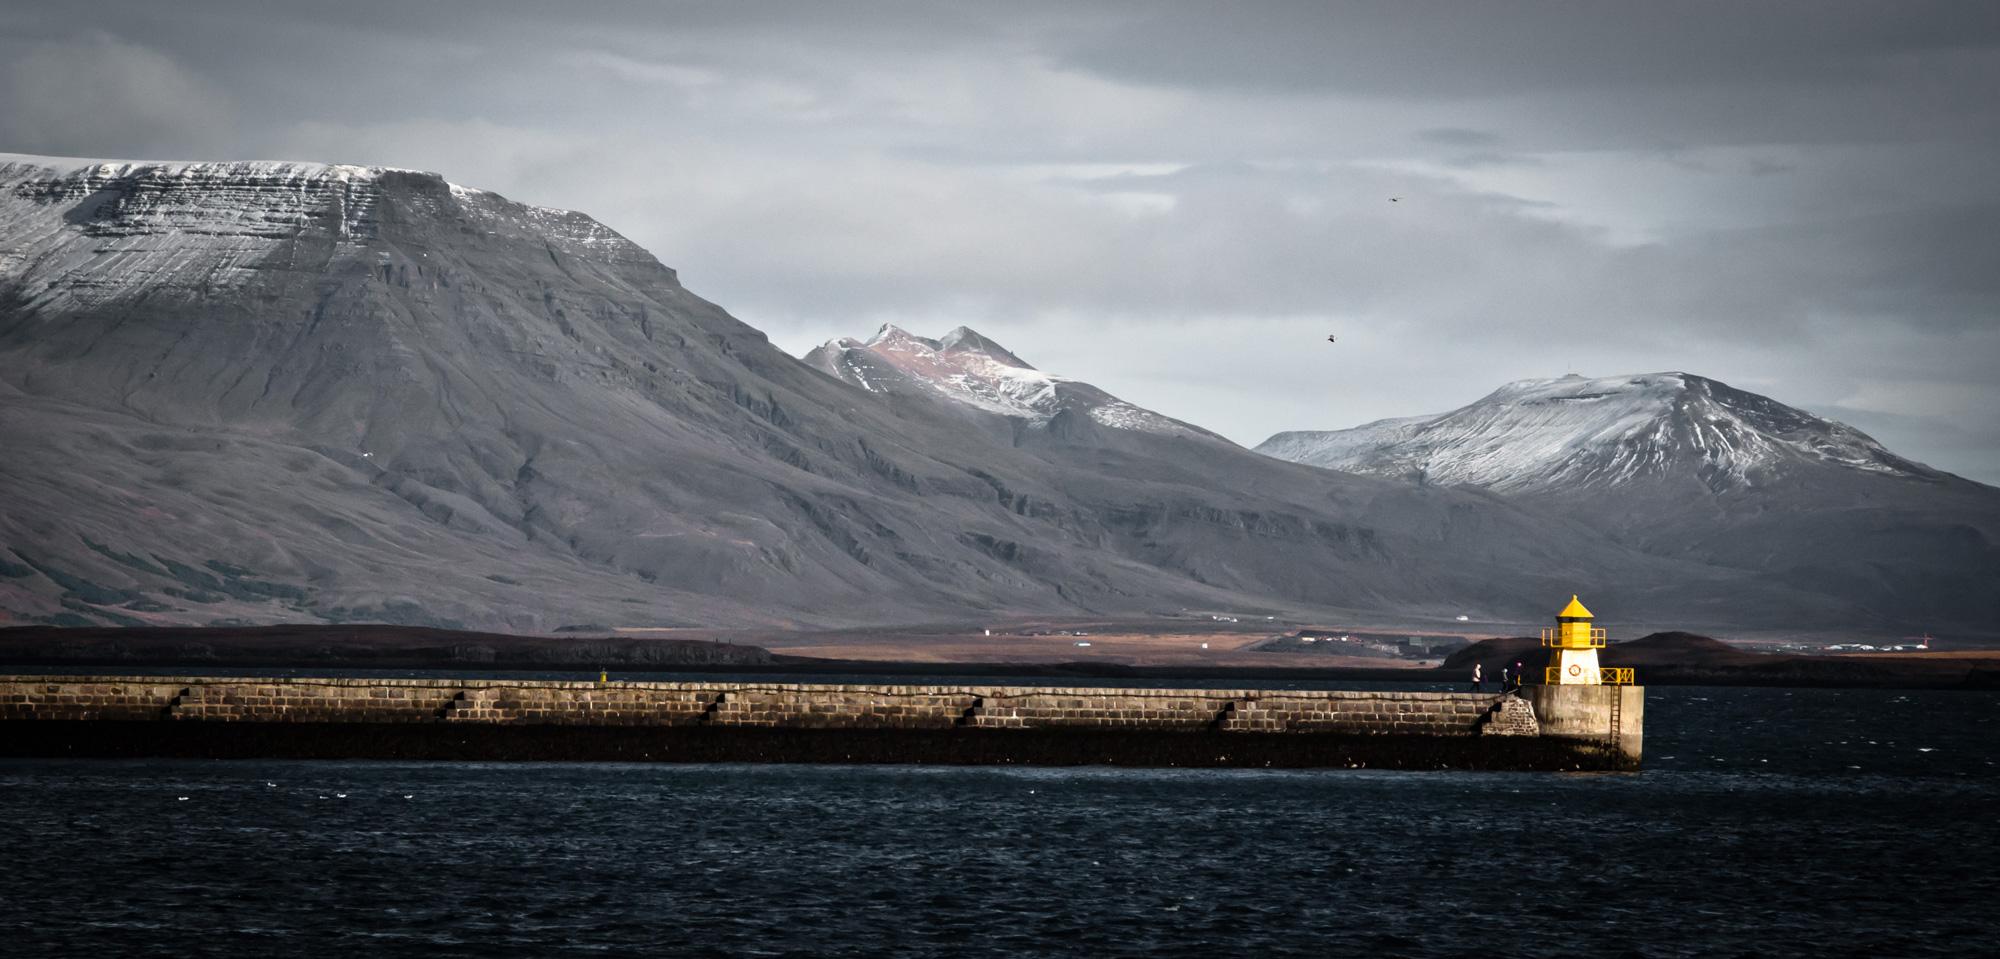 planx-iceland-fotoreportage-02d